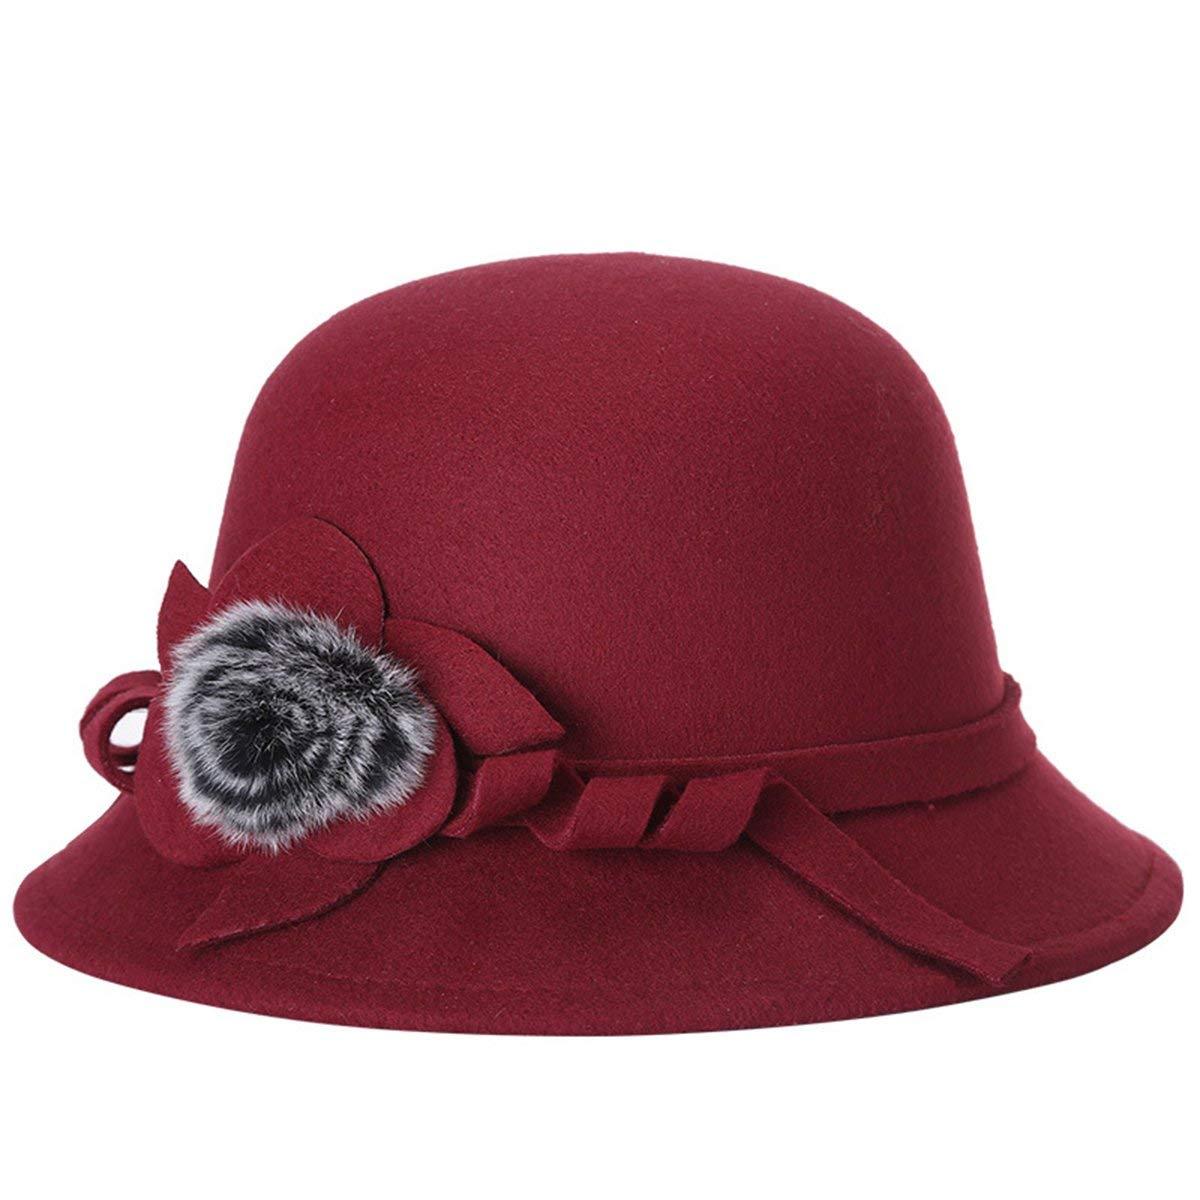 1a00f5d85338c Get Quotations · EUBUY Women Vintage Wool Felt Bowler Hat Winter Fedora Hat  Floppy Hat Wide Brim Cloche Hat